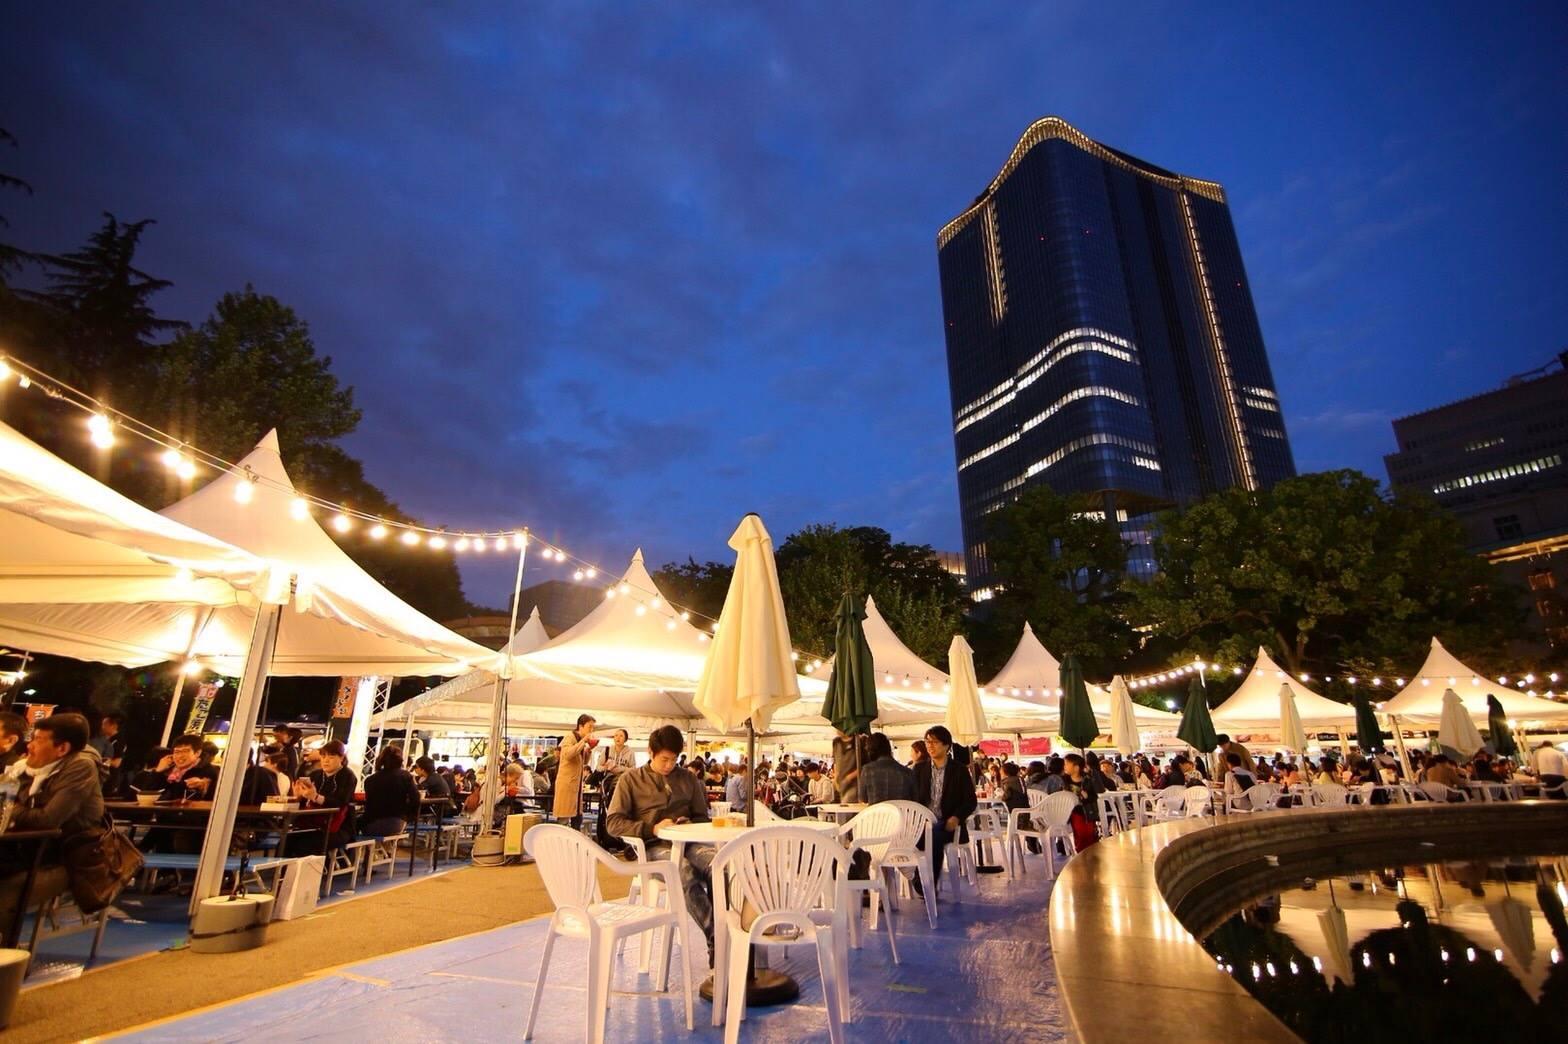 Japan Food Park